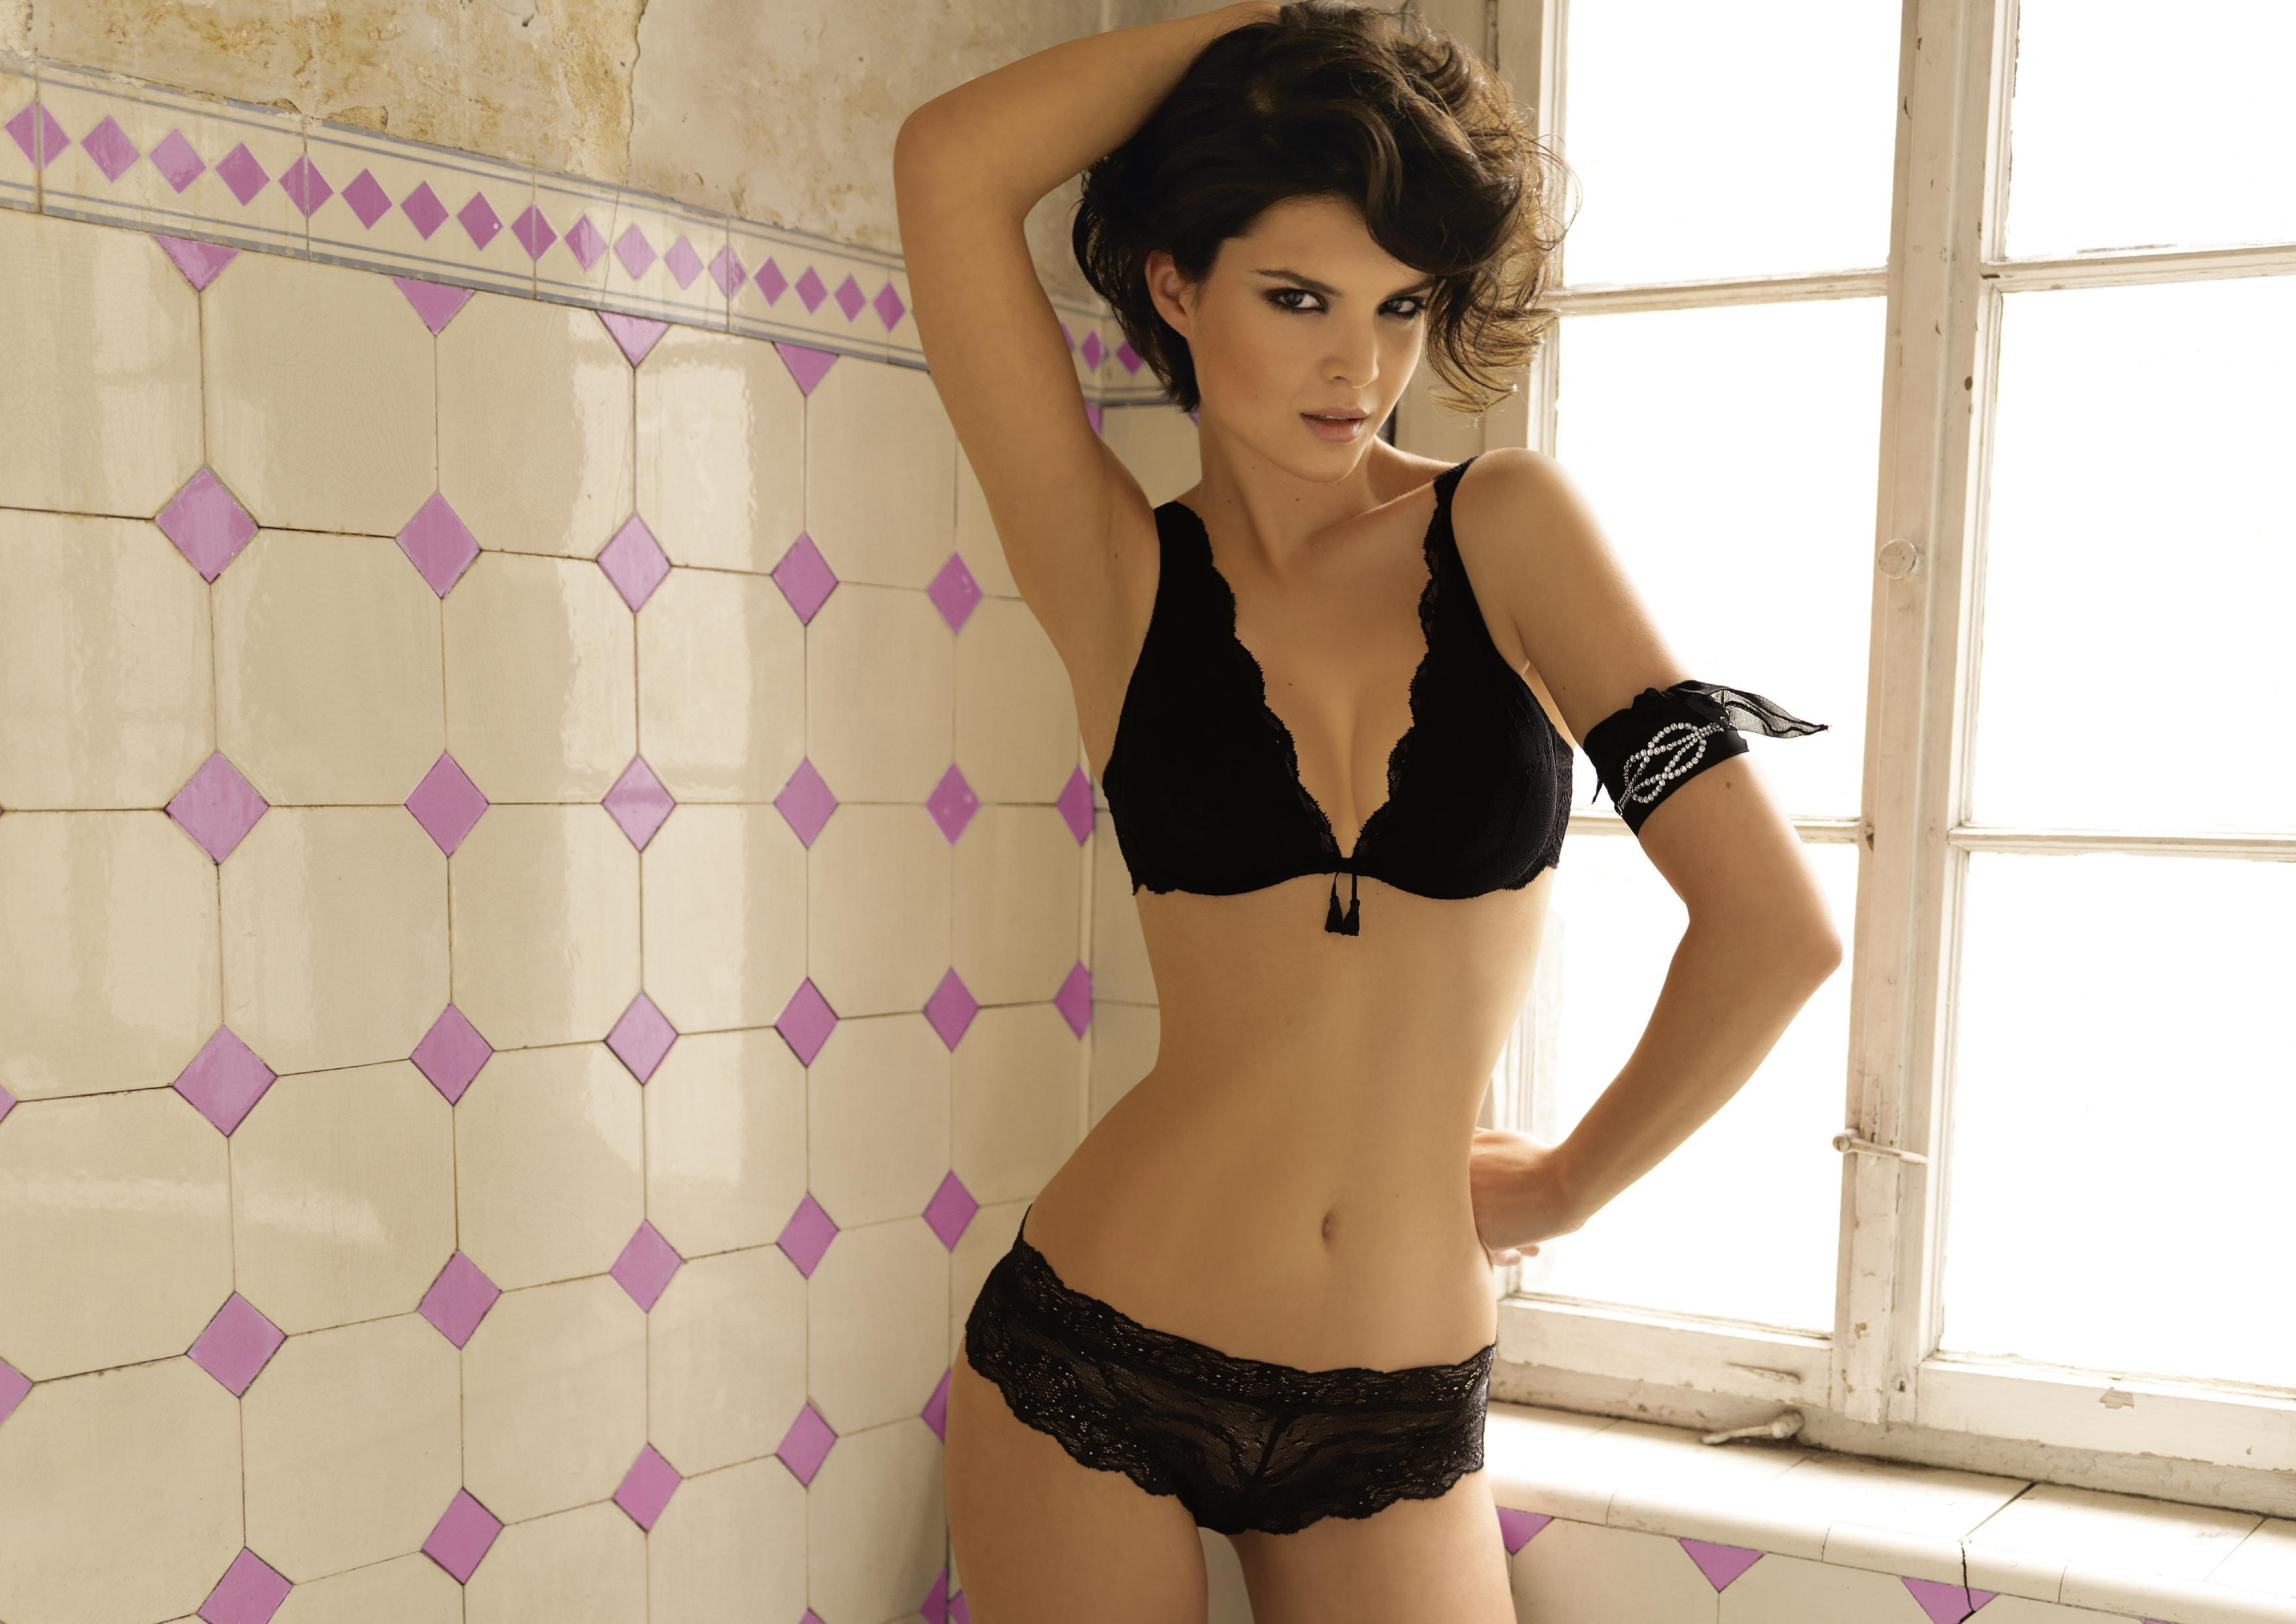 Patricia Schmid in lingerie